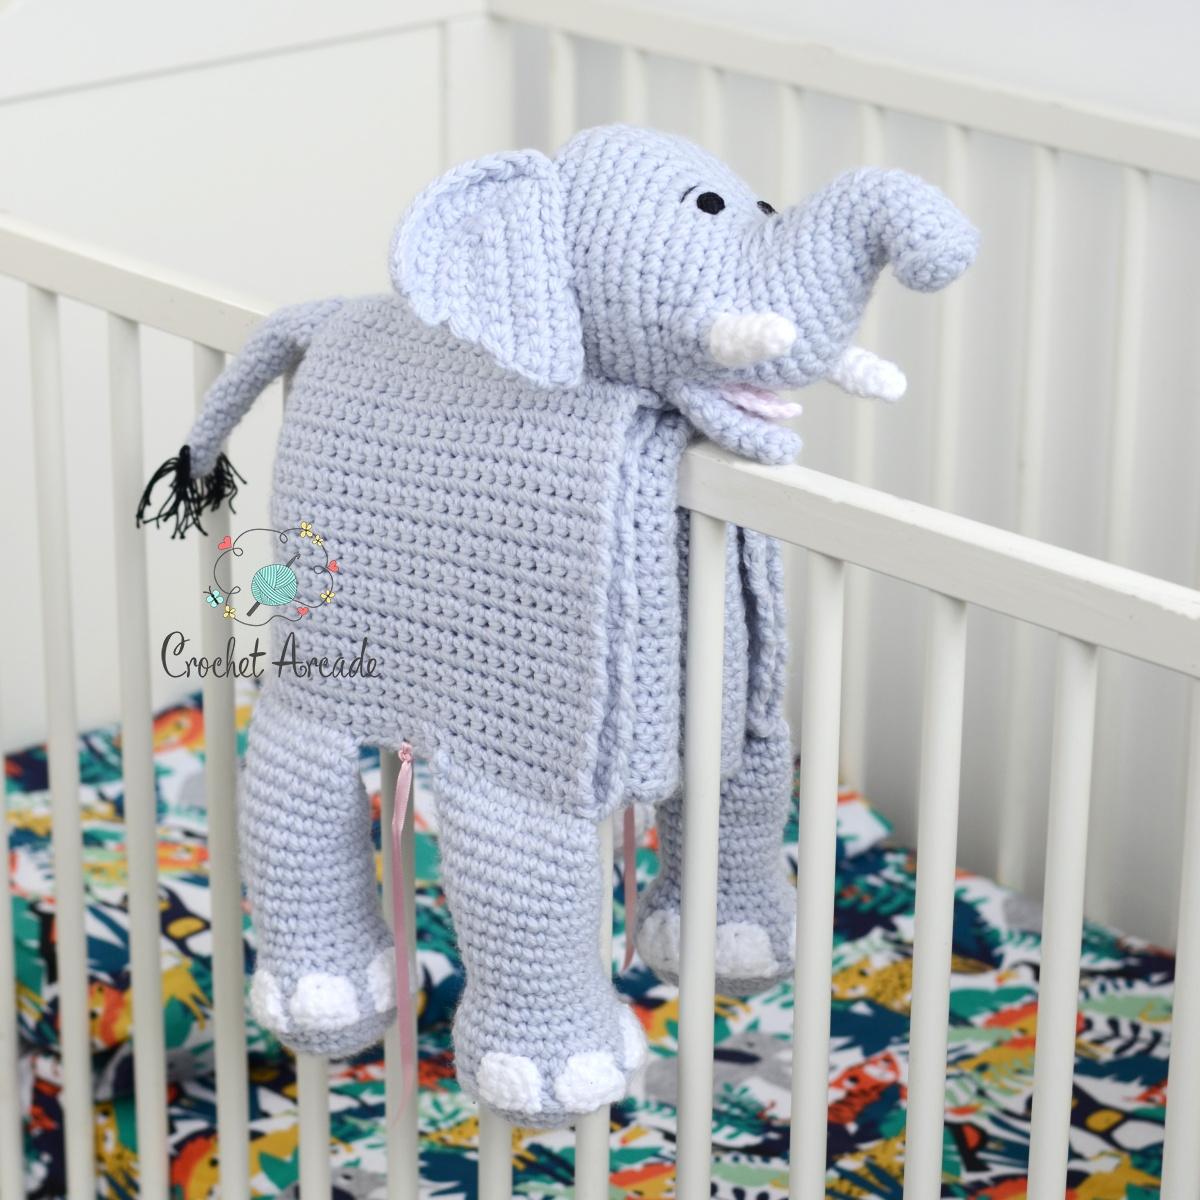 Cuddle And Play Elephant Baby Blanket Crochet Pattern Crochet Arcade